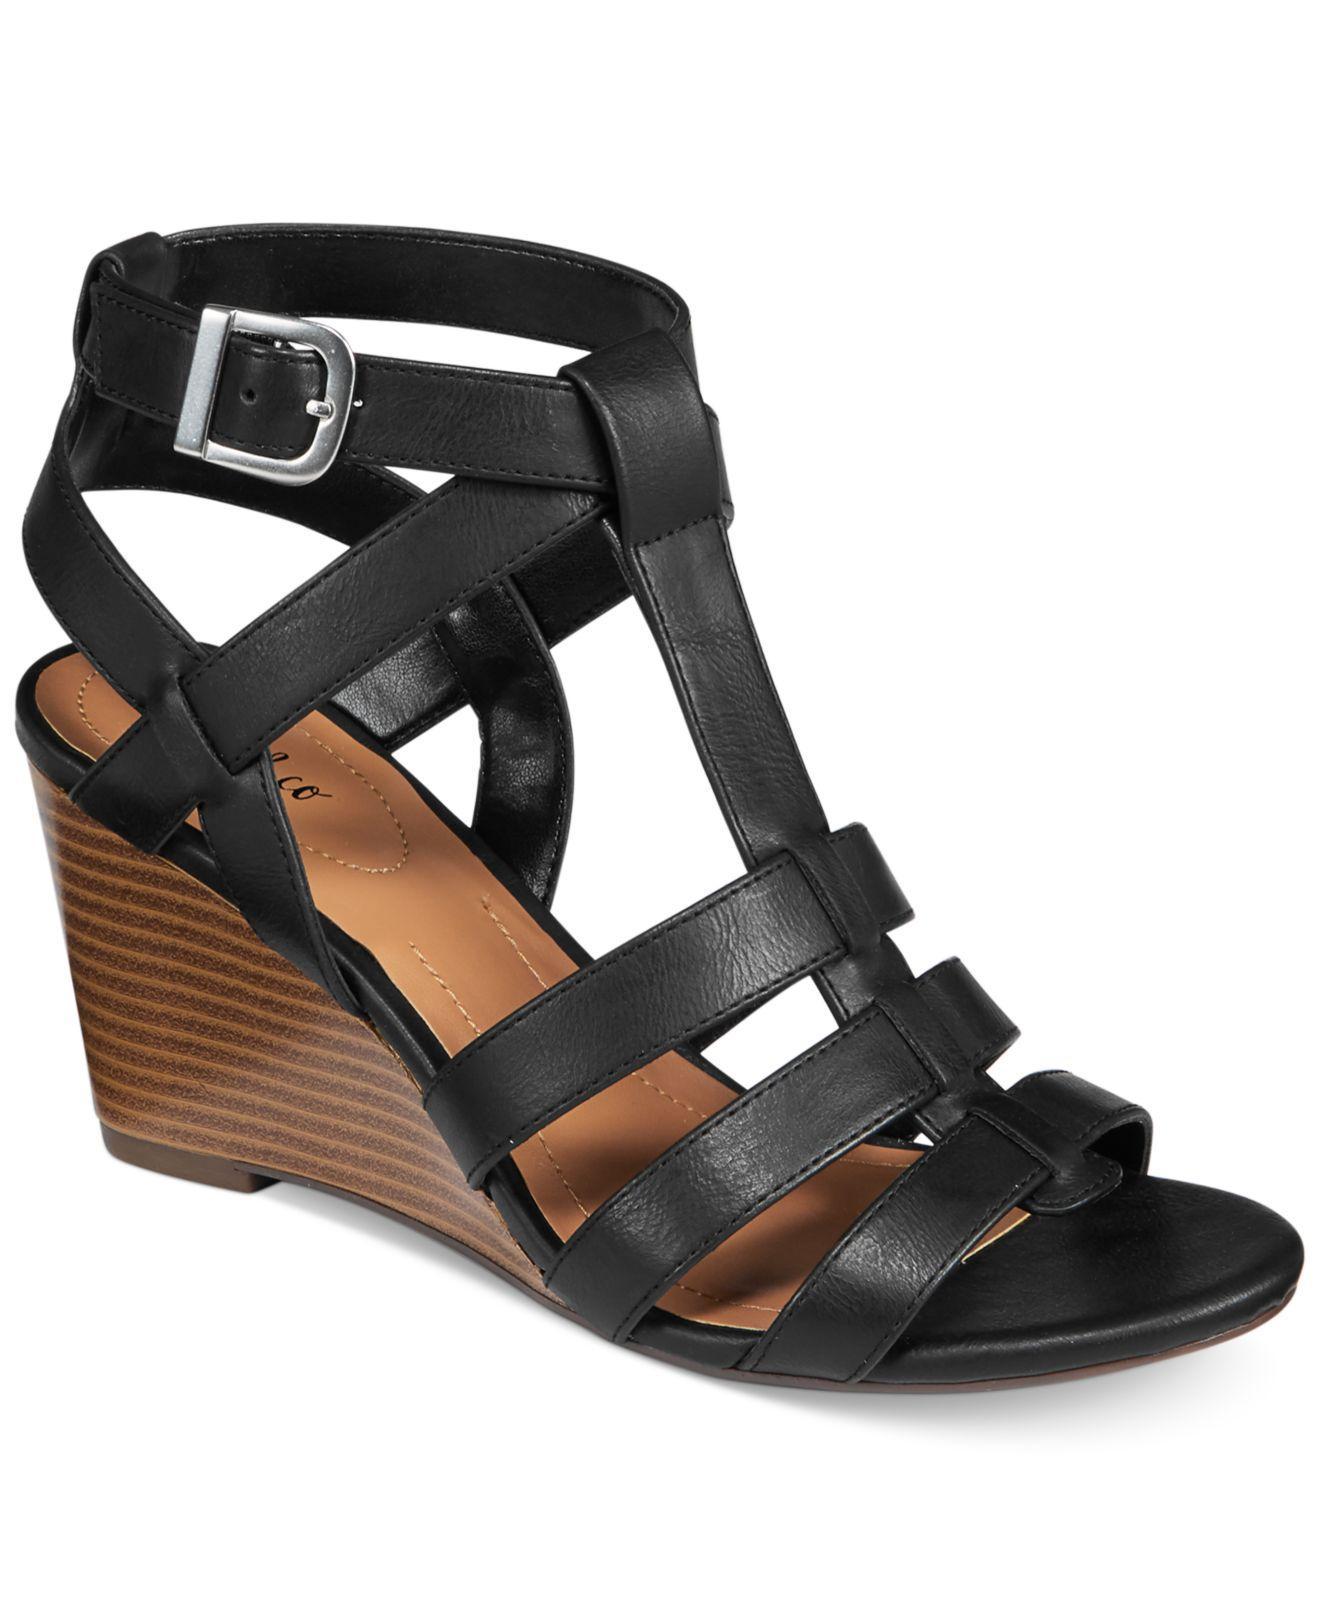 cbb5de312bc Style   Co. Womens Haydar Open Toe Casual Platform Sandals